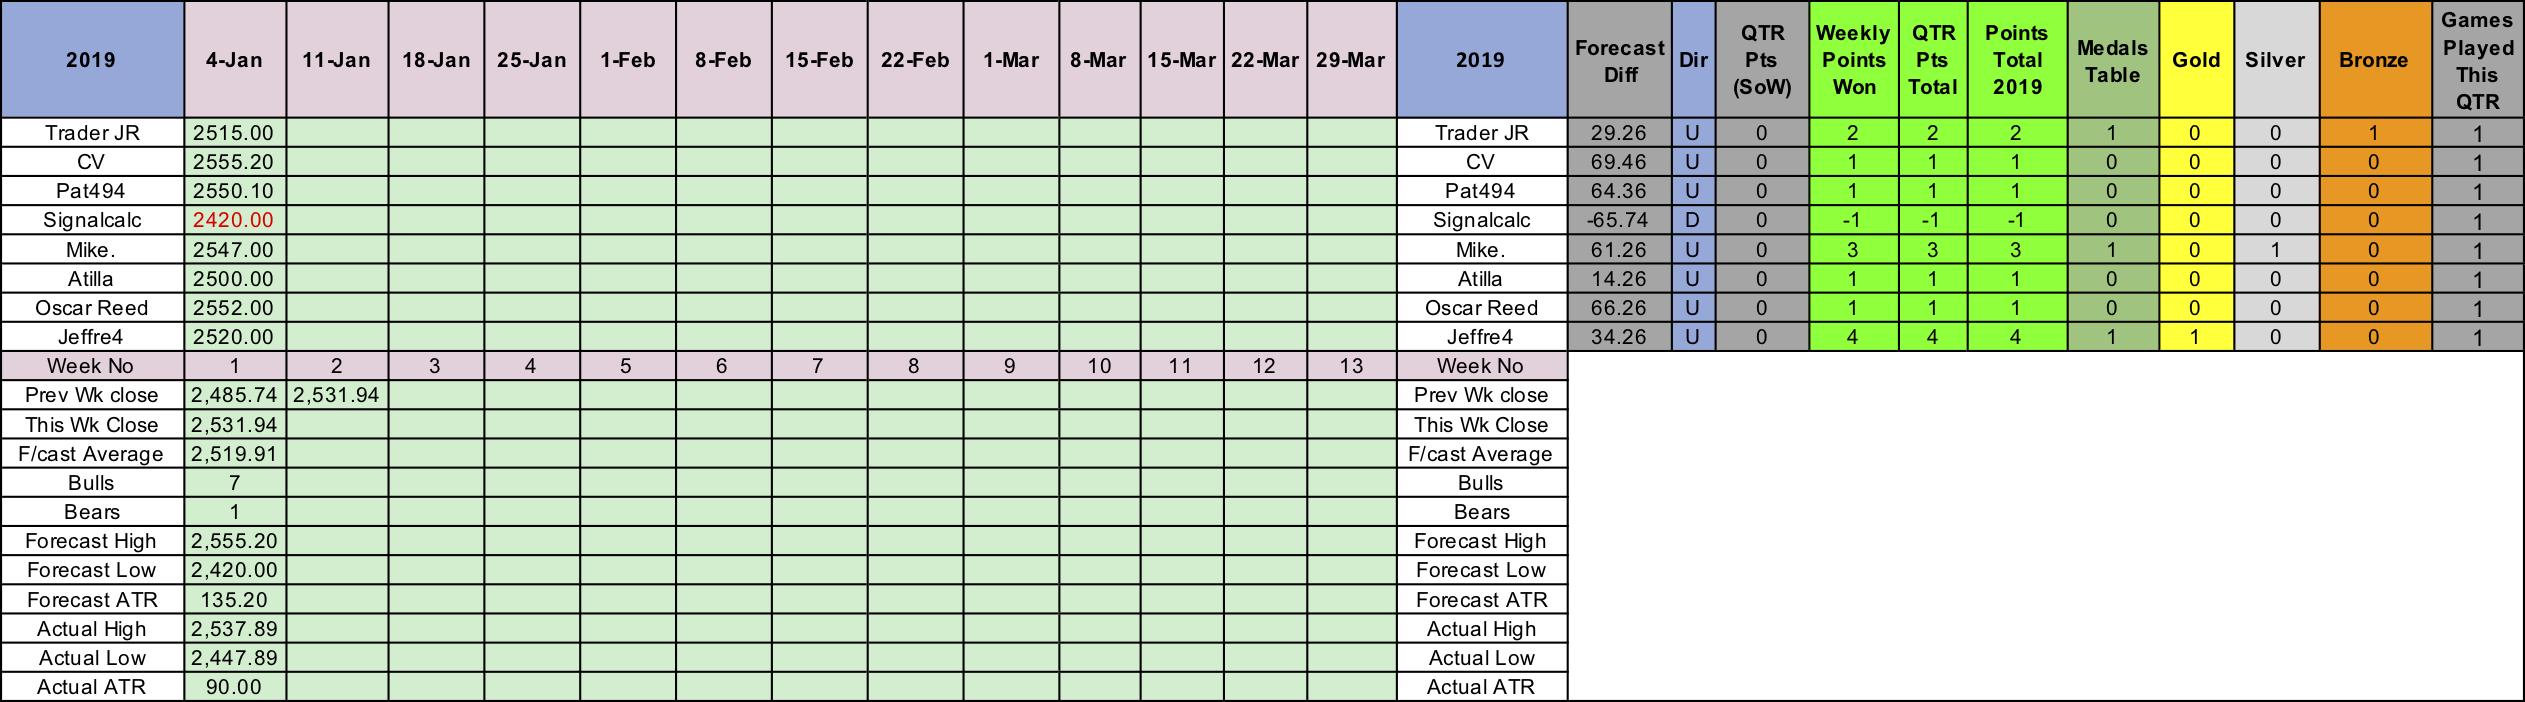 SP500 Weekly results 04Jan19.png